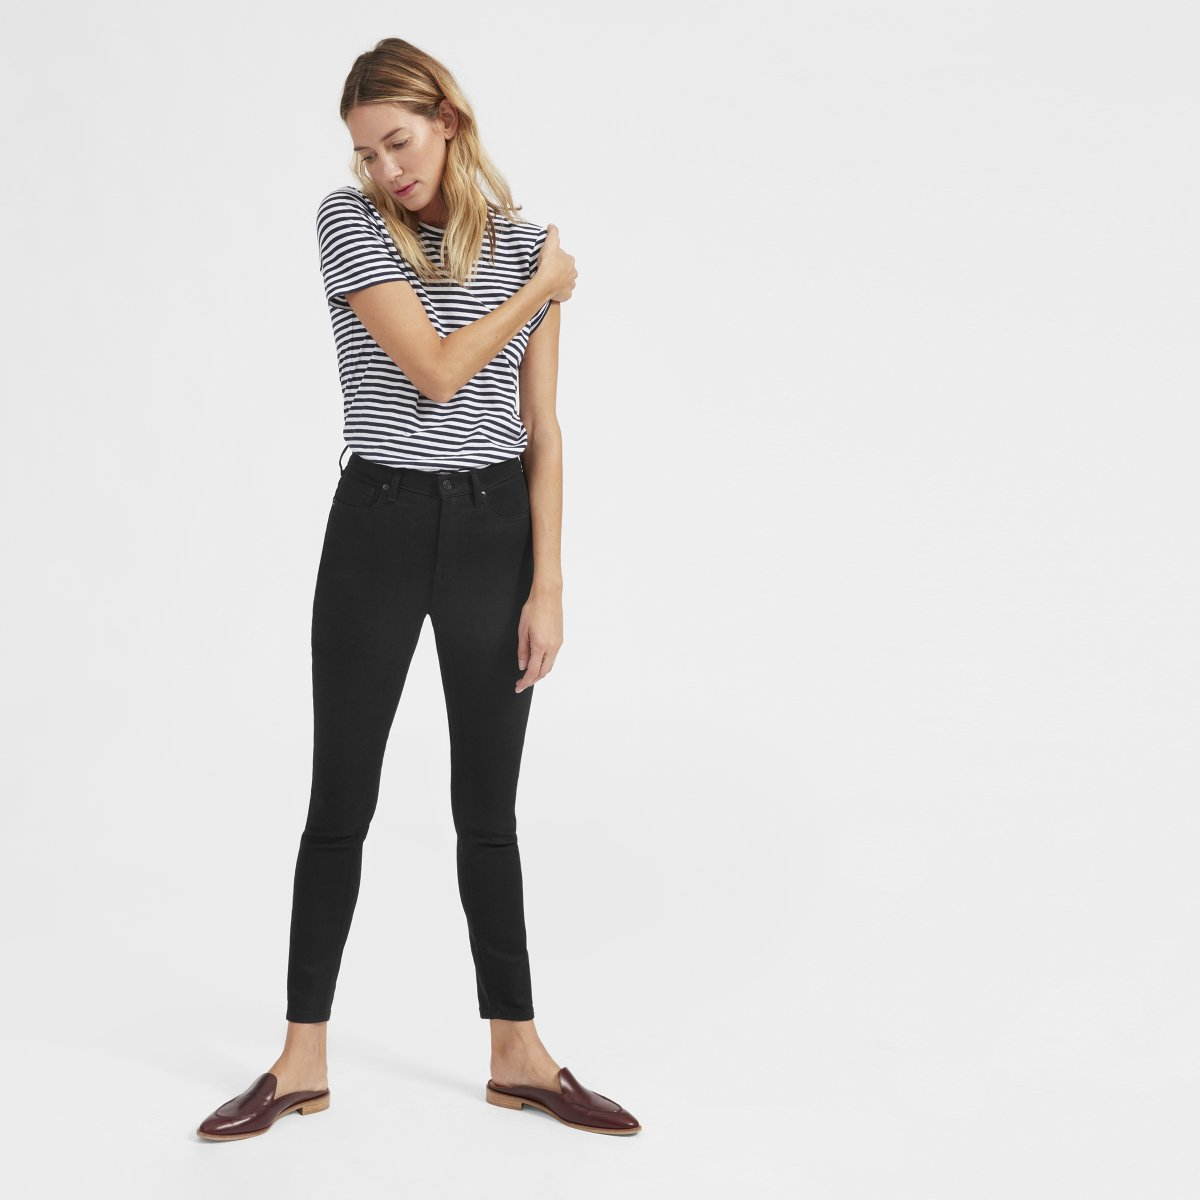 8be6a225ed The High-Rise Skinny Jean